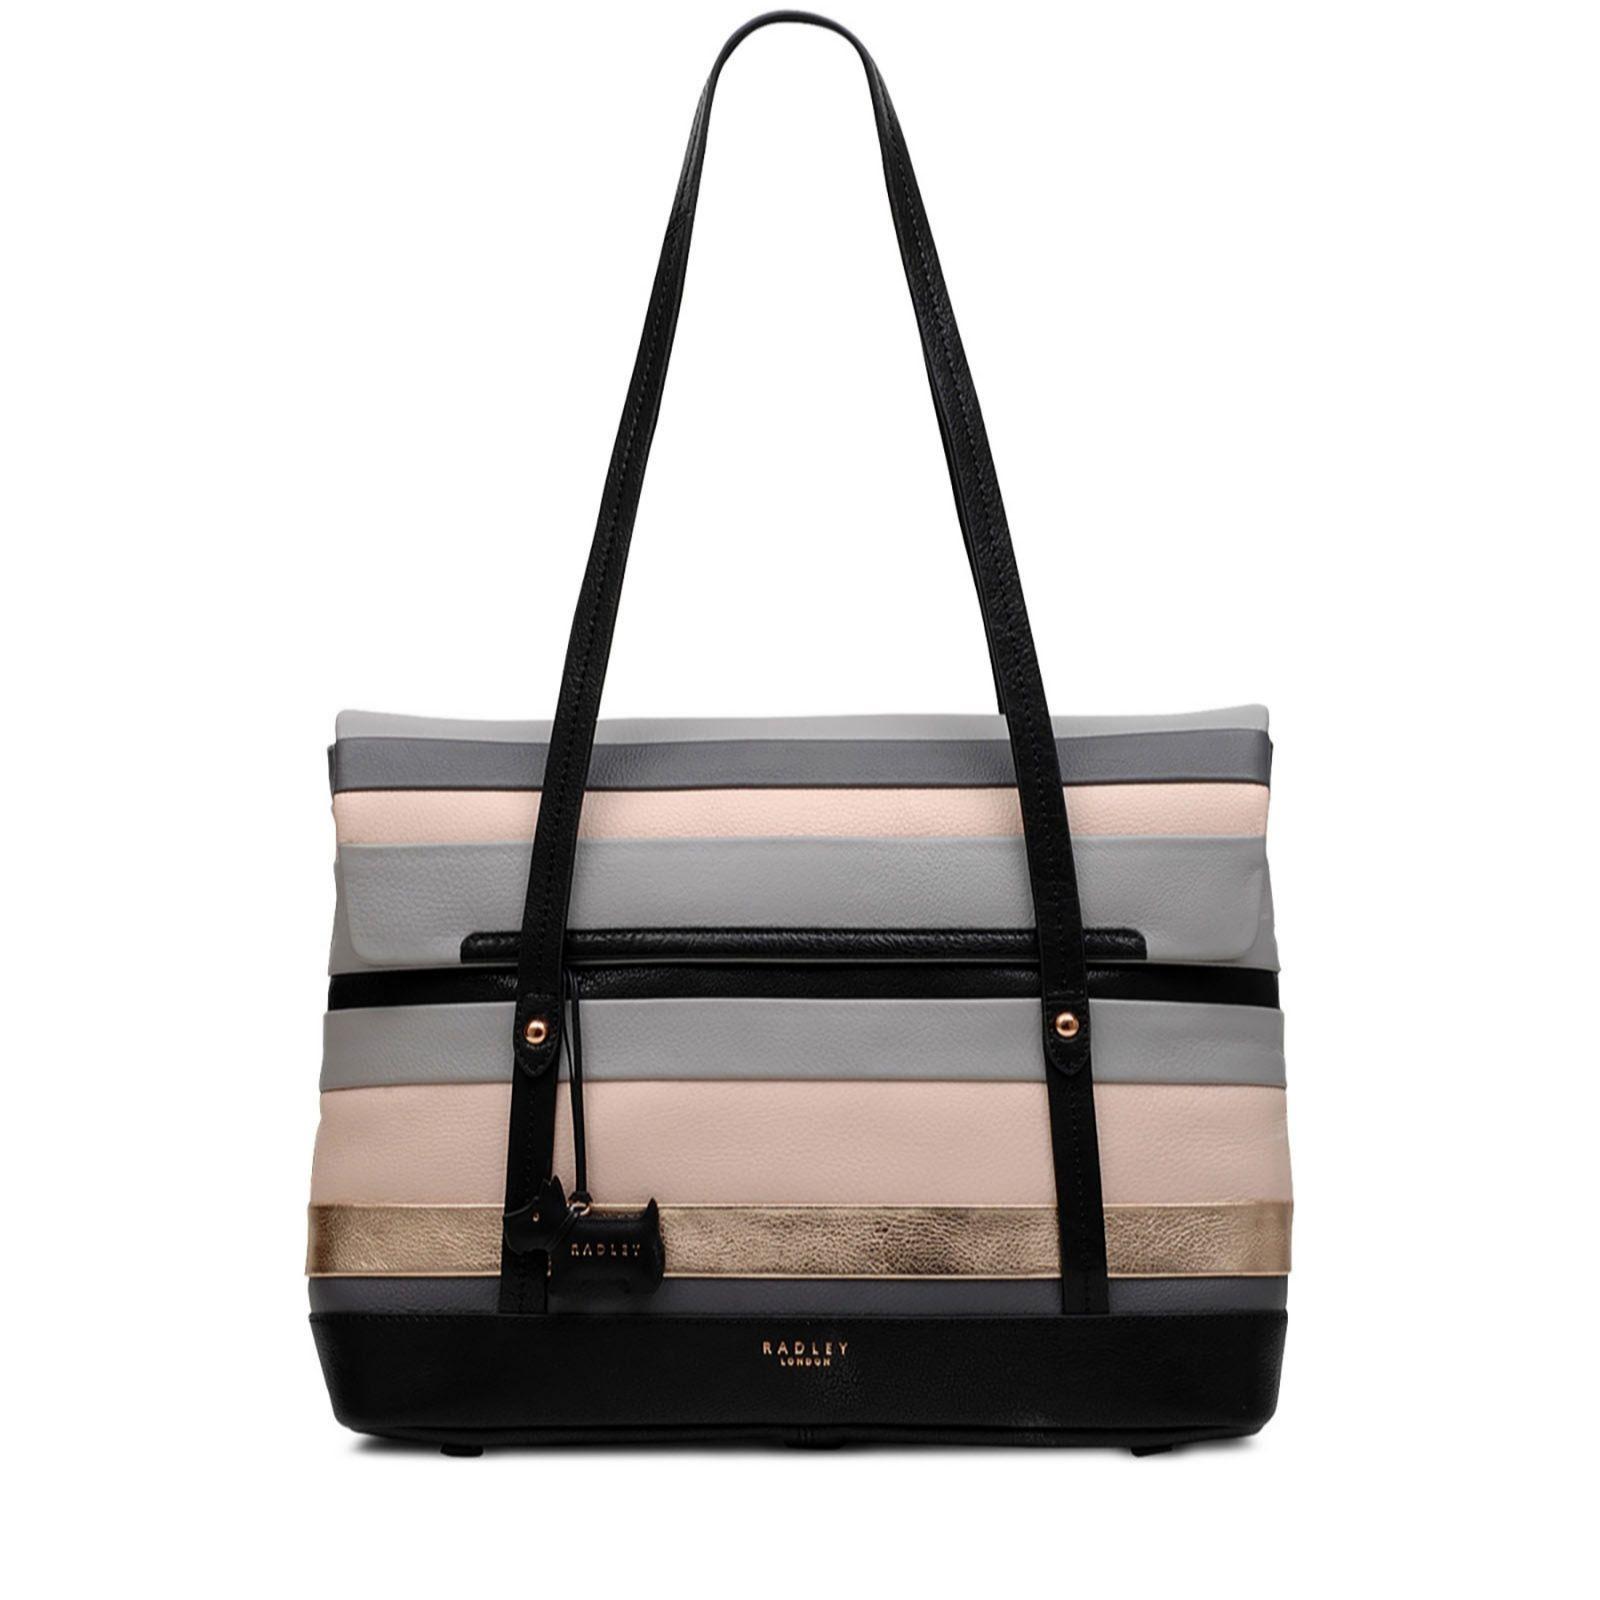 a9f1a82c9 Radley London Eaton Hall Medium Shoulder Bag - QVC UK